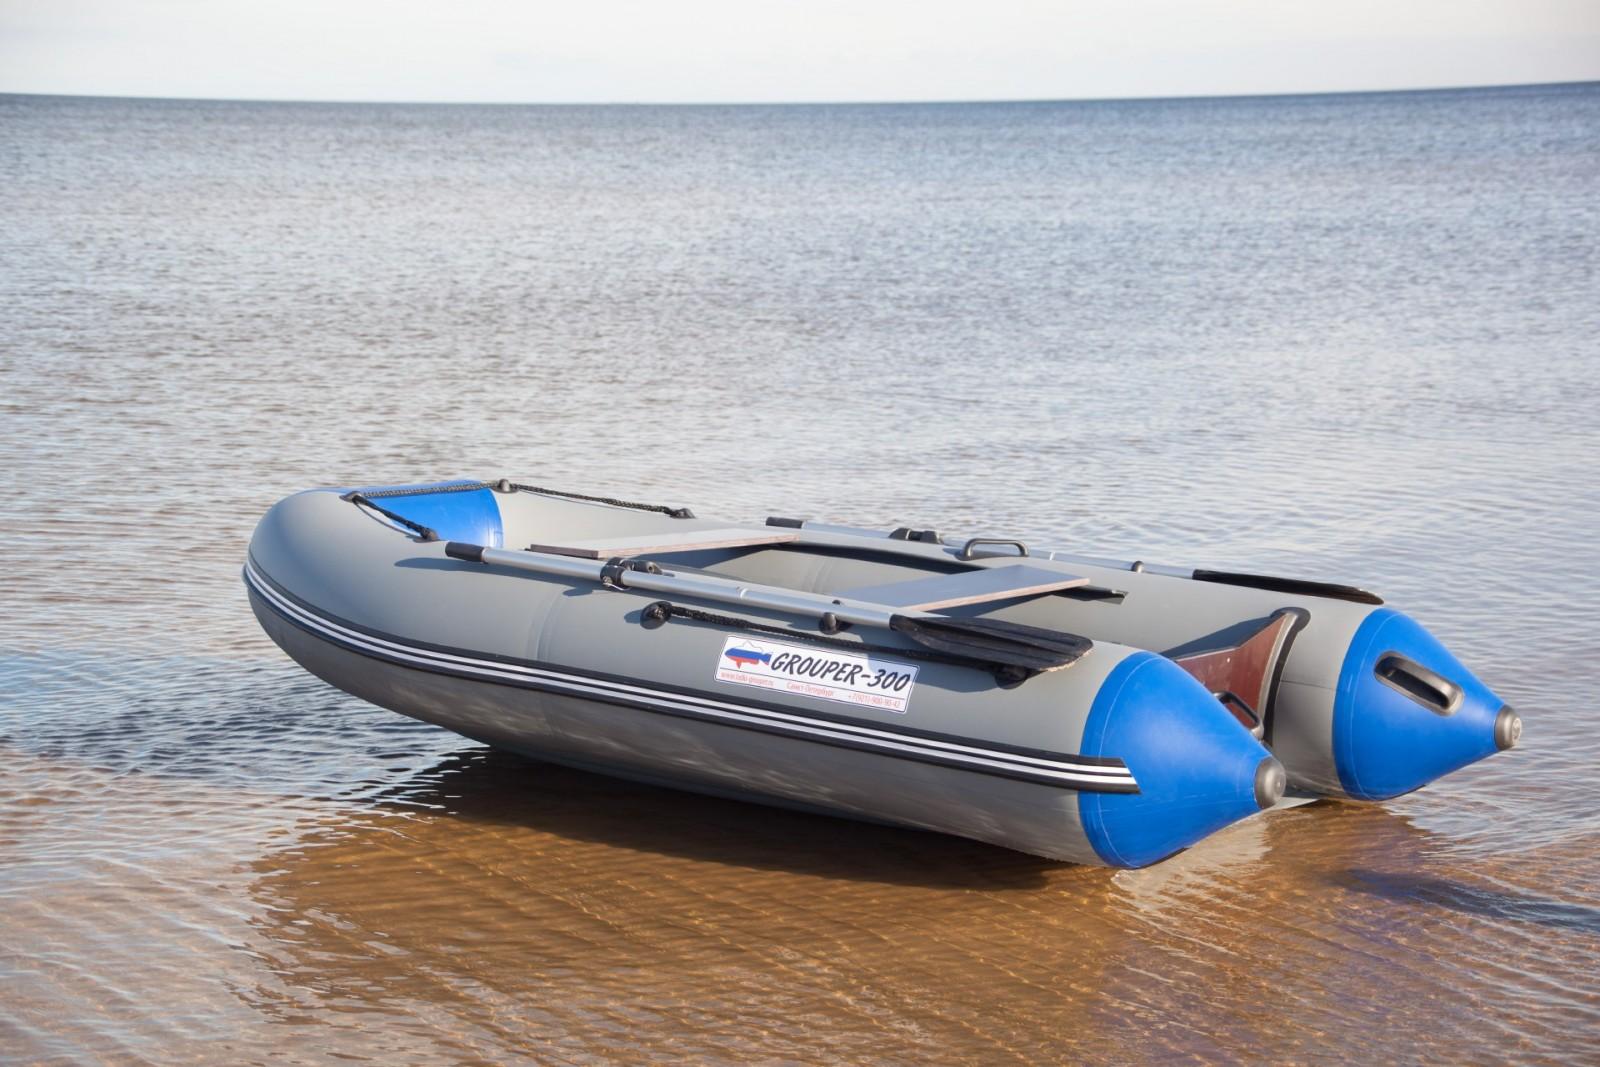 купить лодку посейдон в полоцке